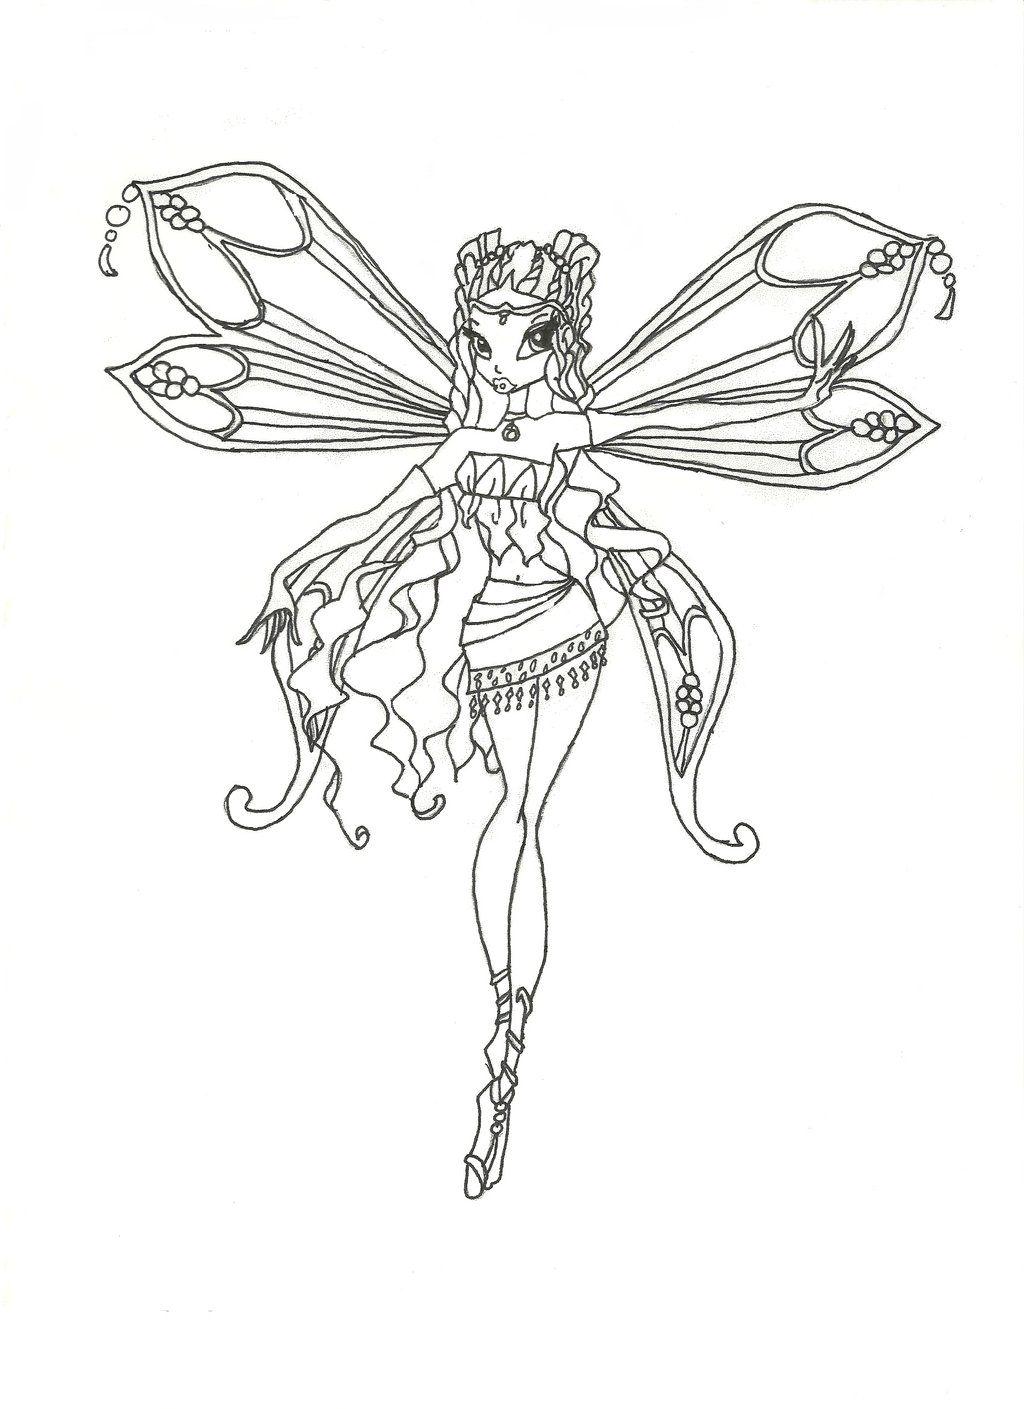 Winx Club Enchantix Layla Coloring Page By Winxmagic237 Deviantart Com On Deviantart Winx Club Coloring Pages Club Color